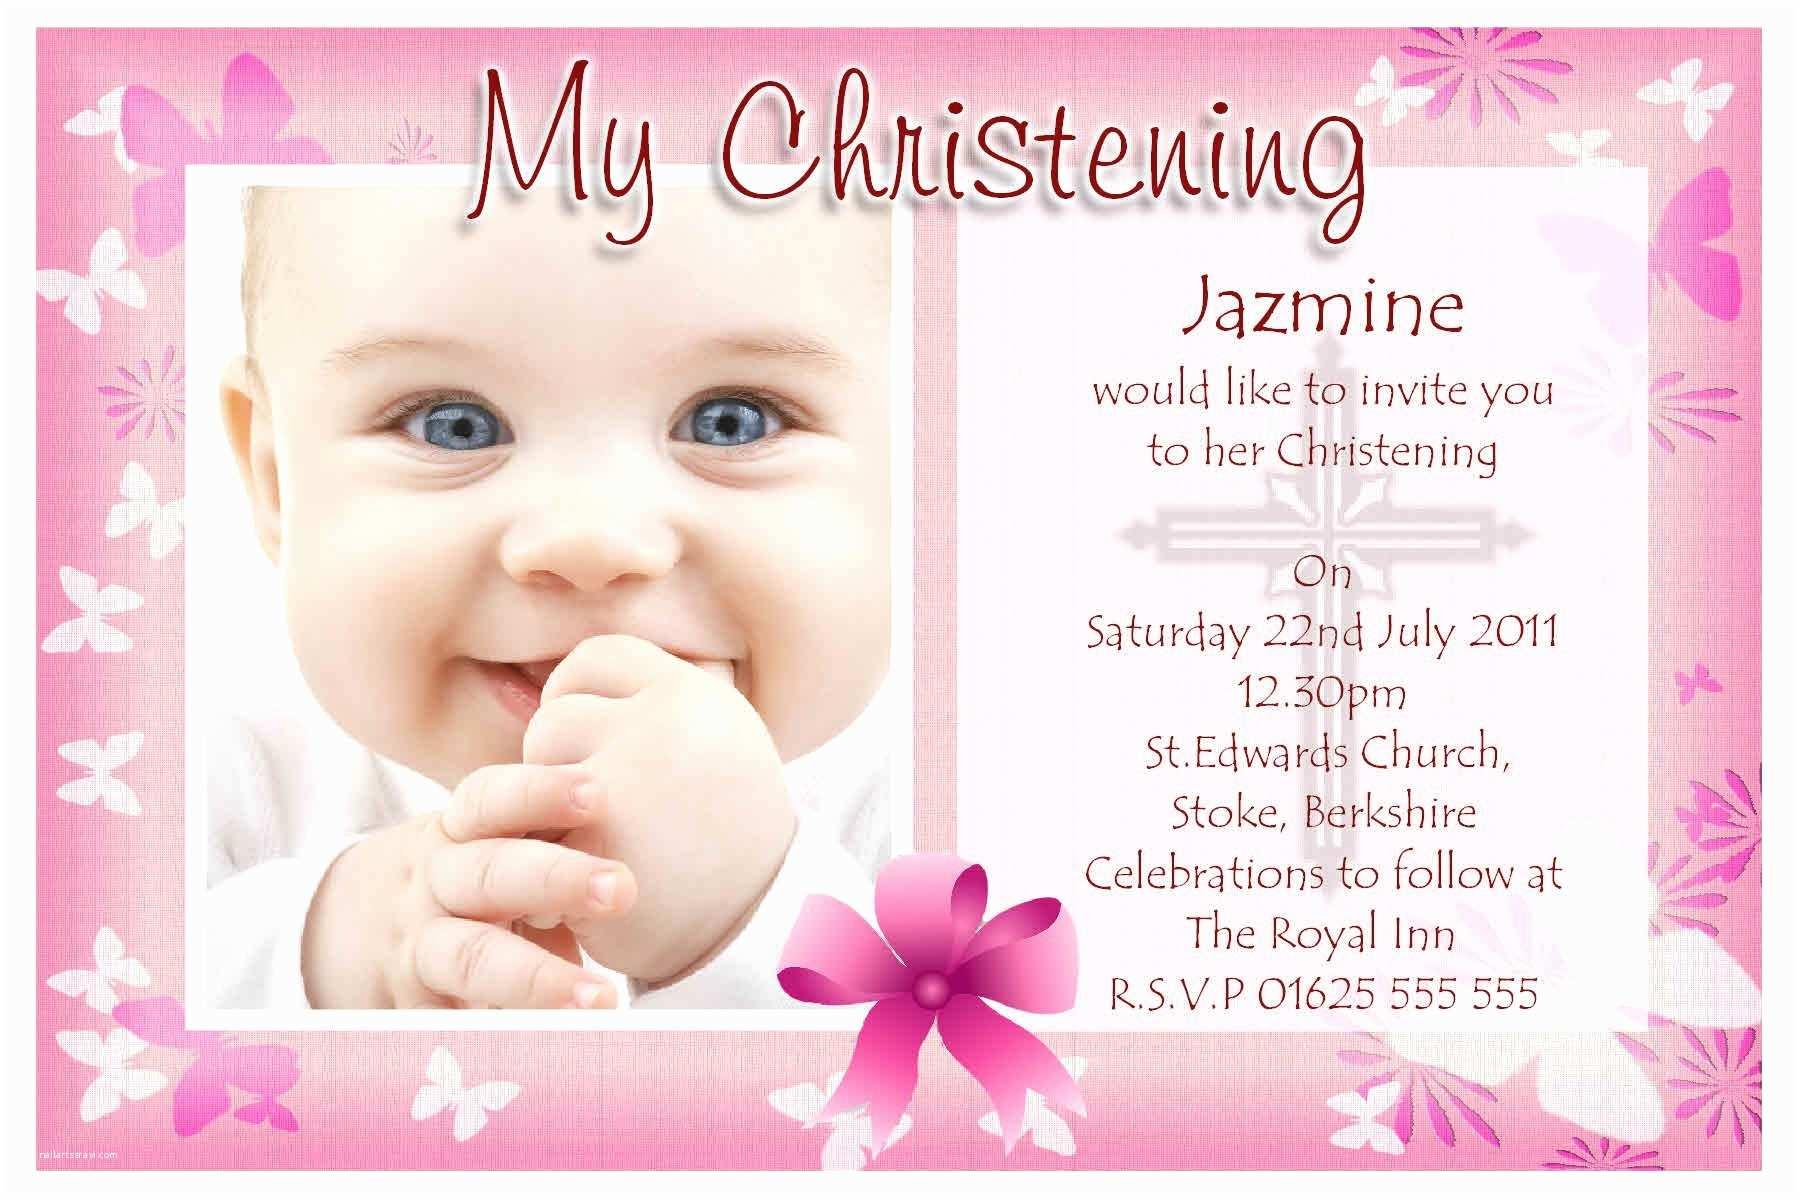 Communion Invitations for Girl Baptism Invitations Free Baptism Invitation Template